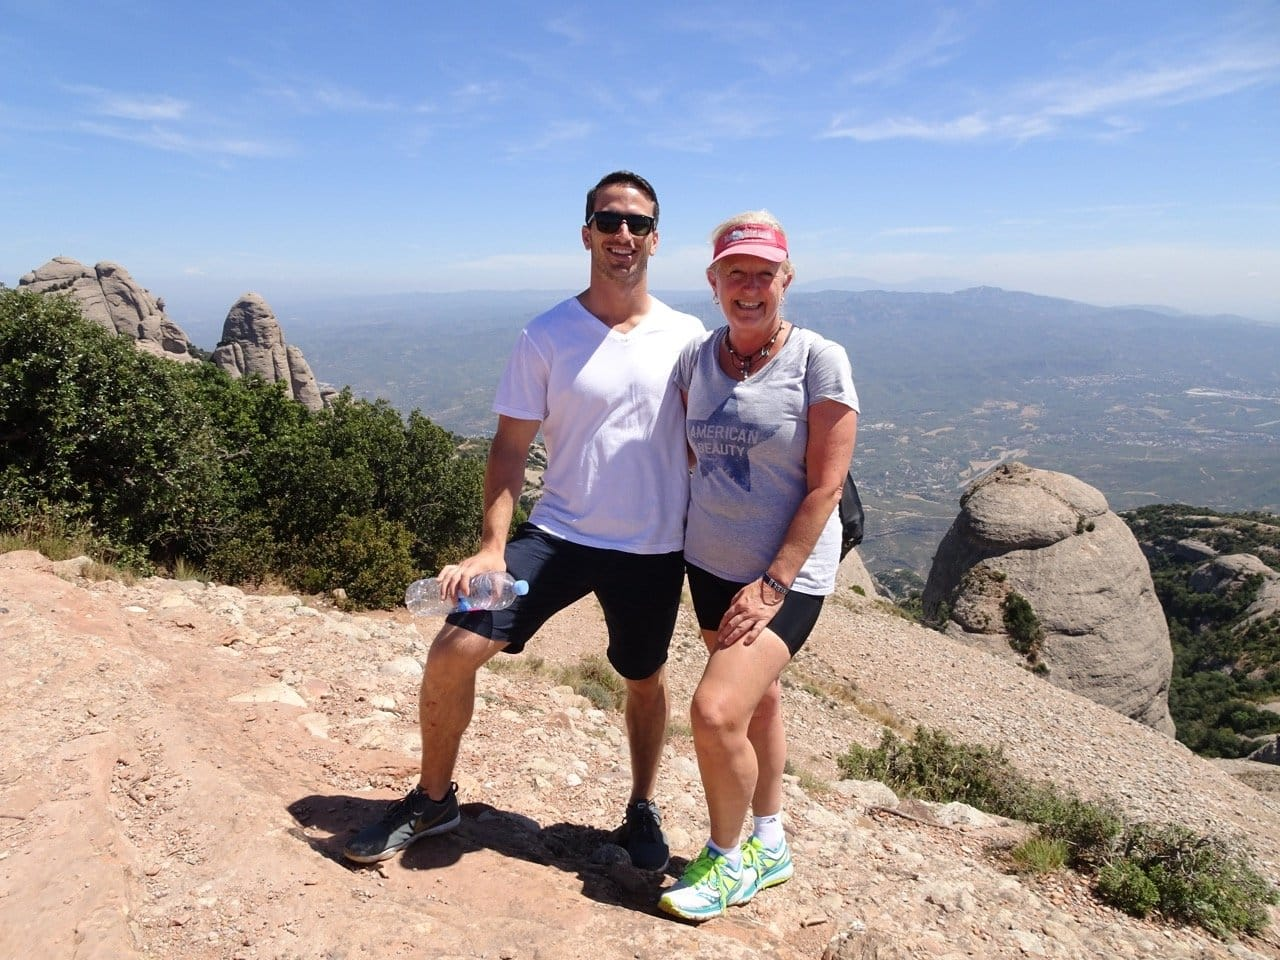 Spain-Monserrat-Tebes-Trail-Melanie-CEO-Rare-Finds-Travel